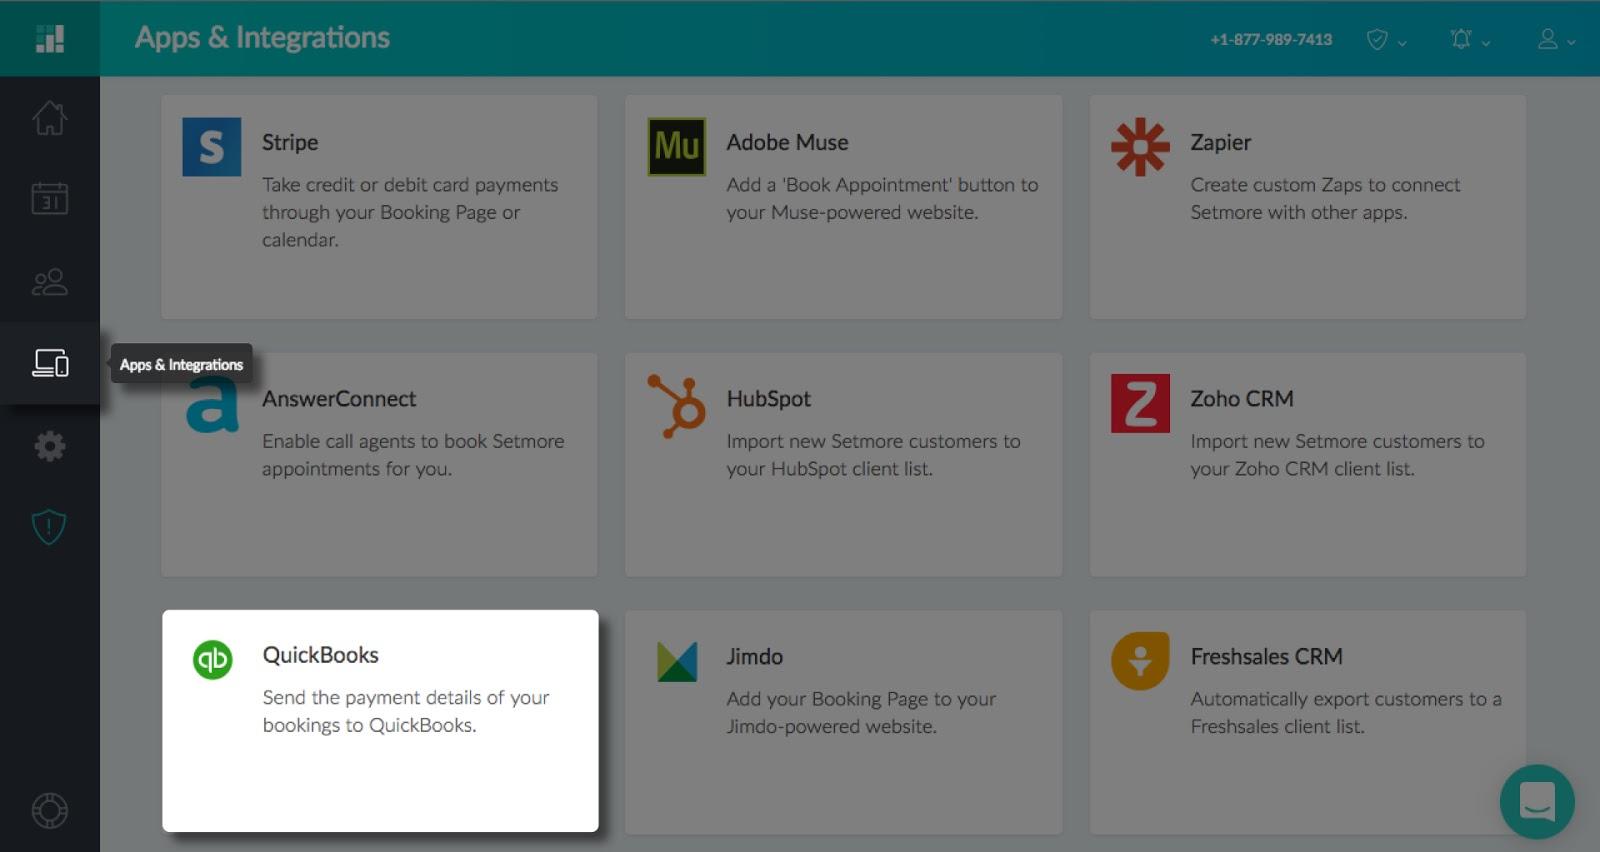 The QuickBooks integration card under Apps & Integrations